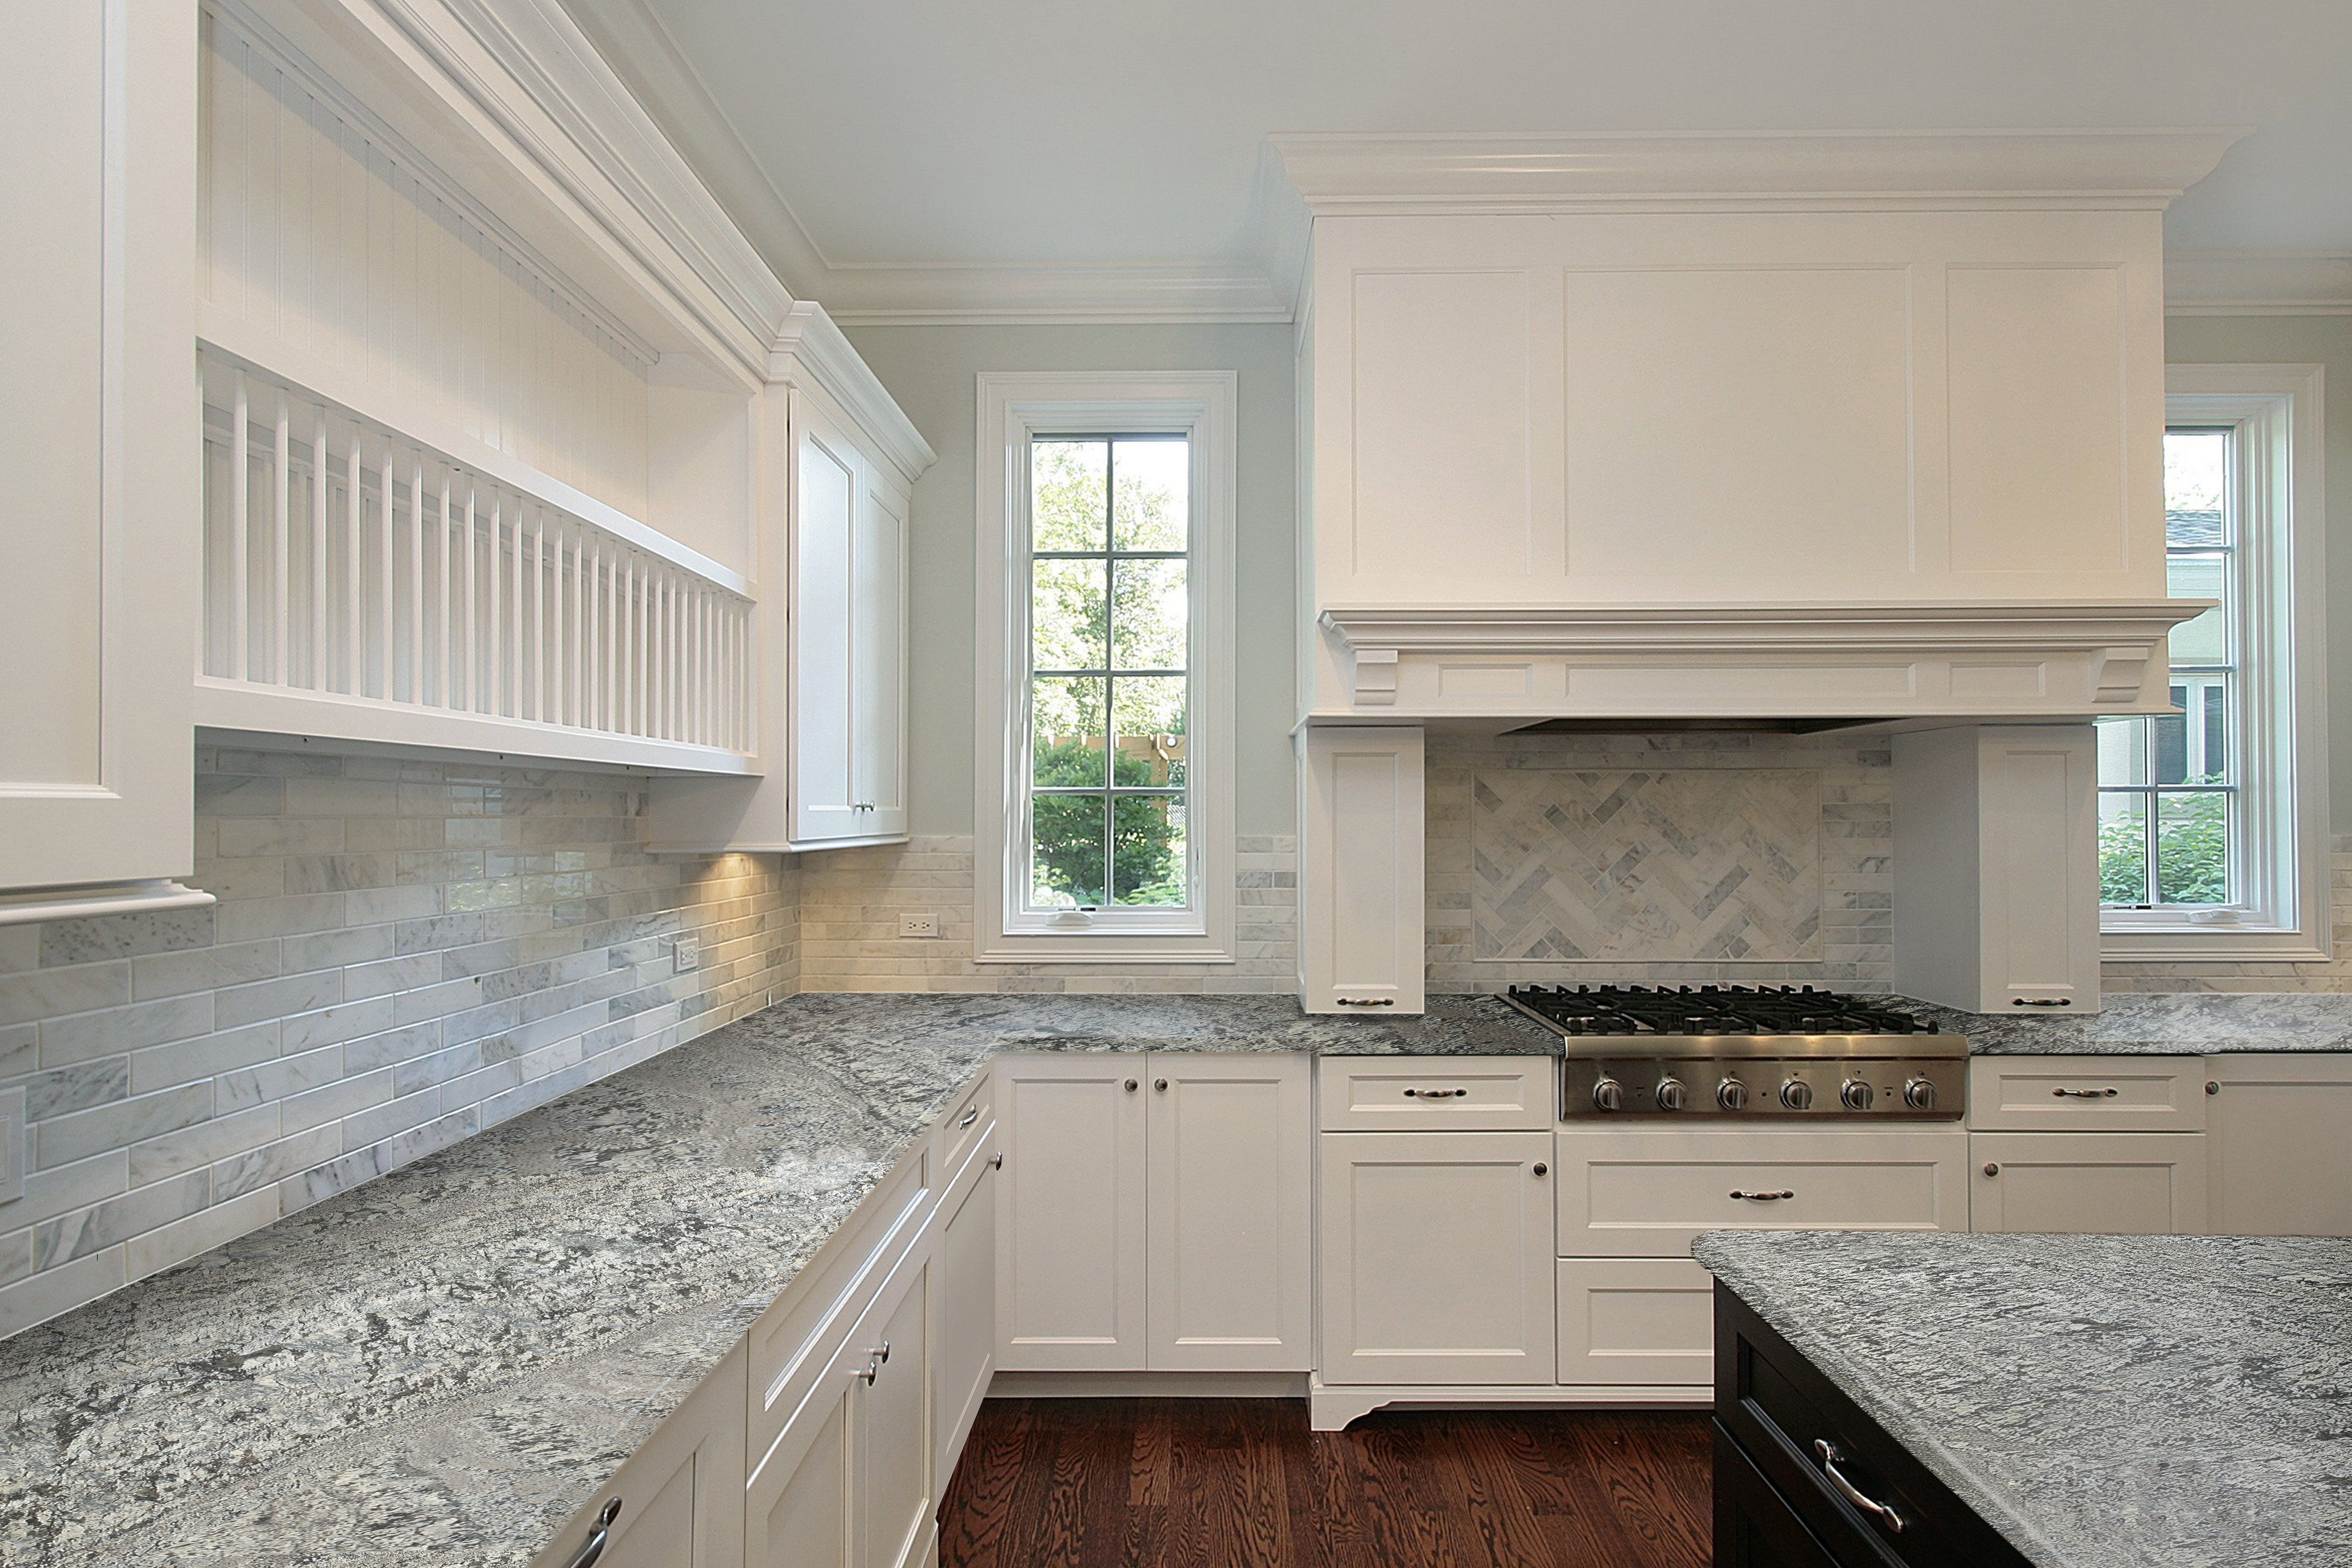 New Azul Aran Granite Kitchen Counter Http Www Marmol Com Pro